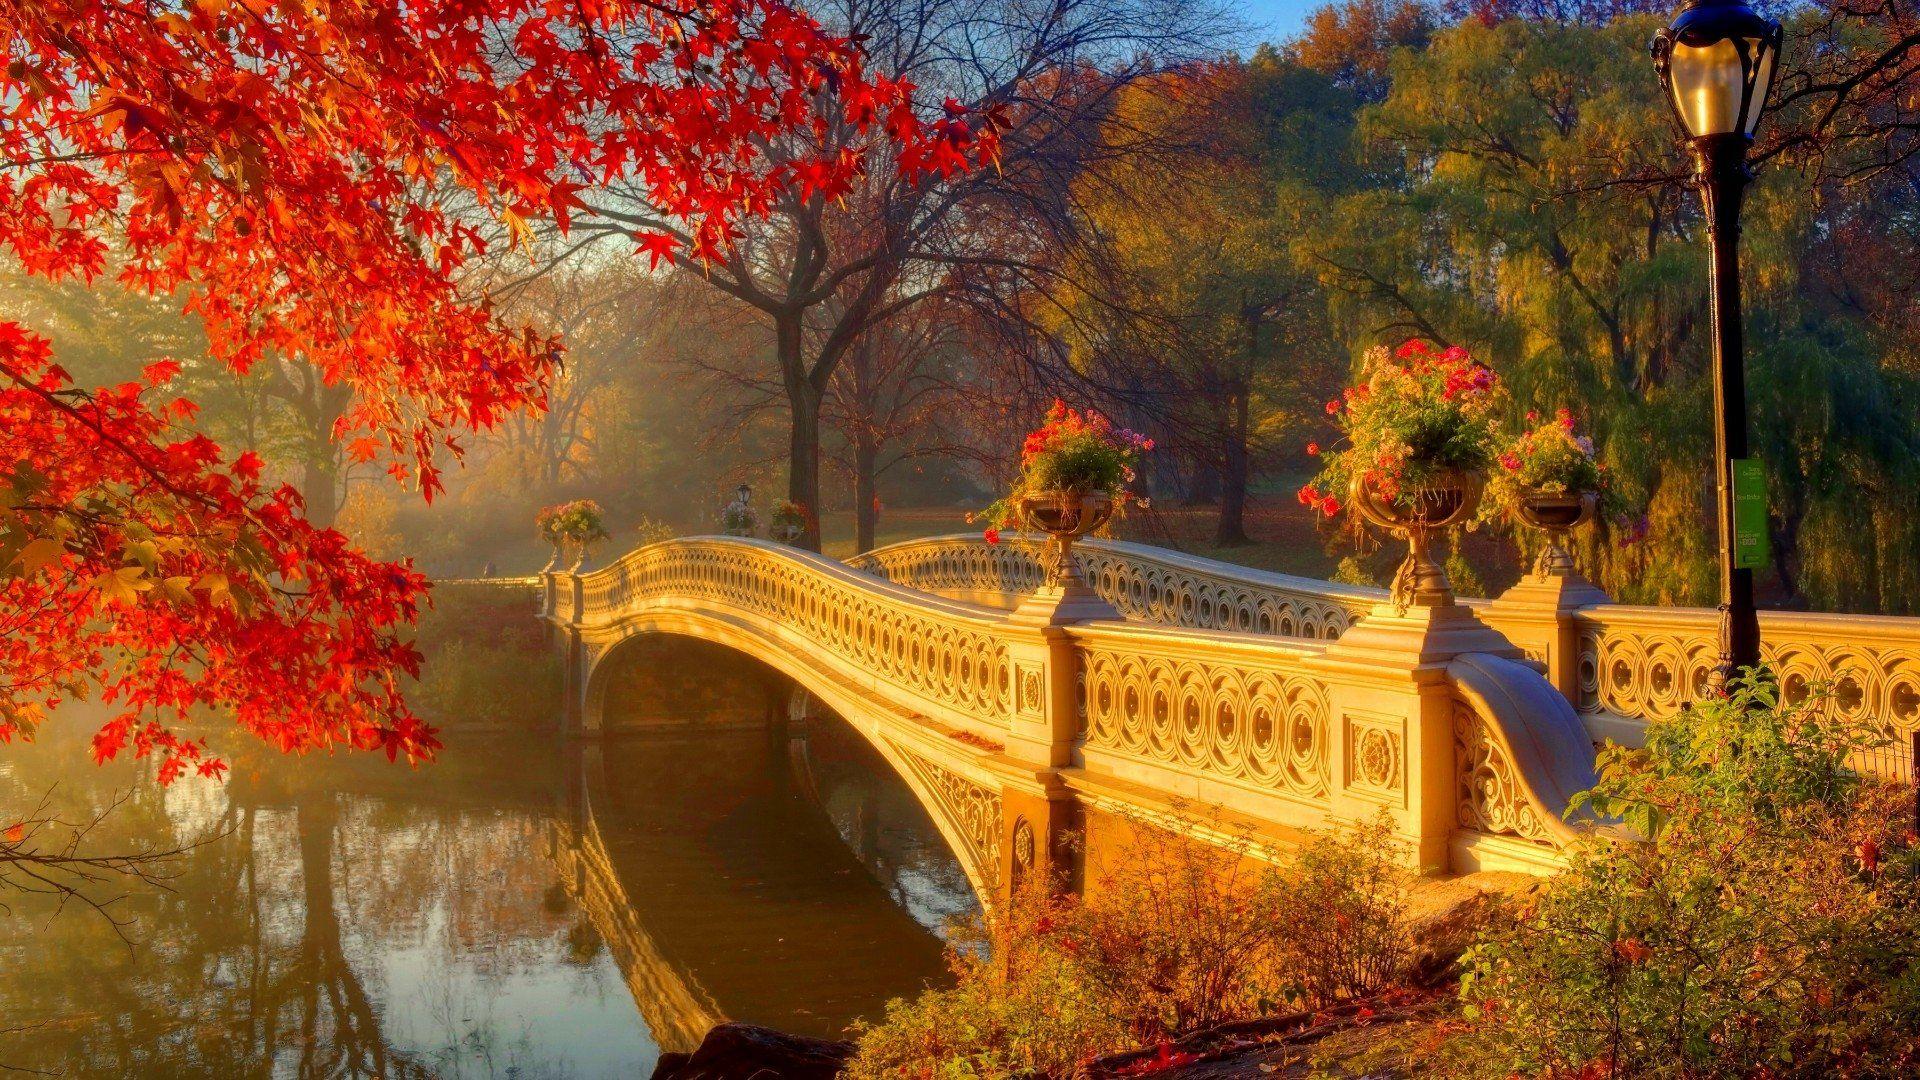 Central Park's Bow Bridge in Autumn Man Made Bridge